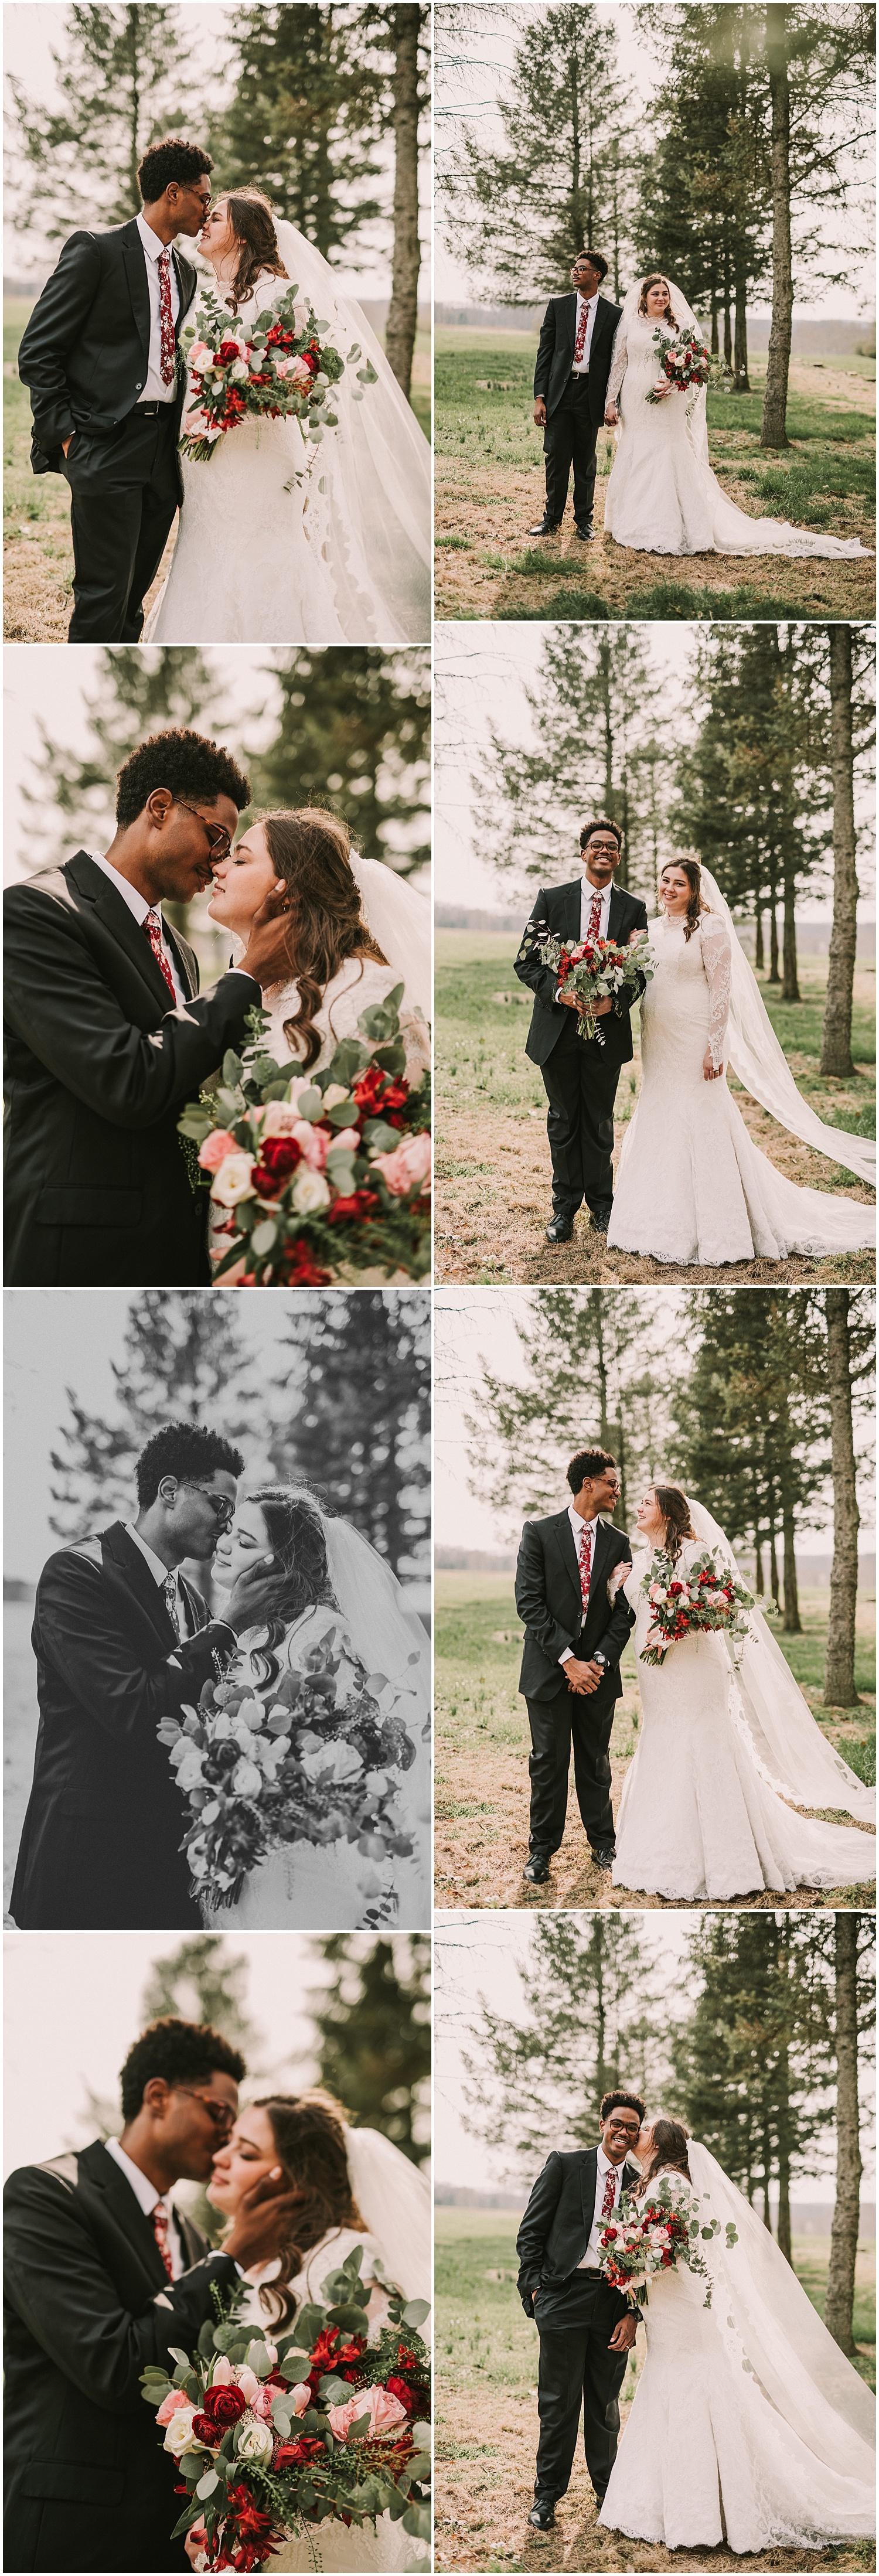 ariannabellephotography-philadelphia LDS wedding (10).jpg